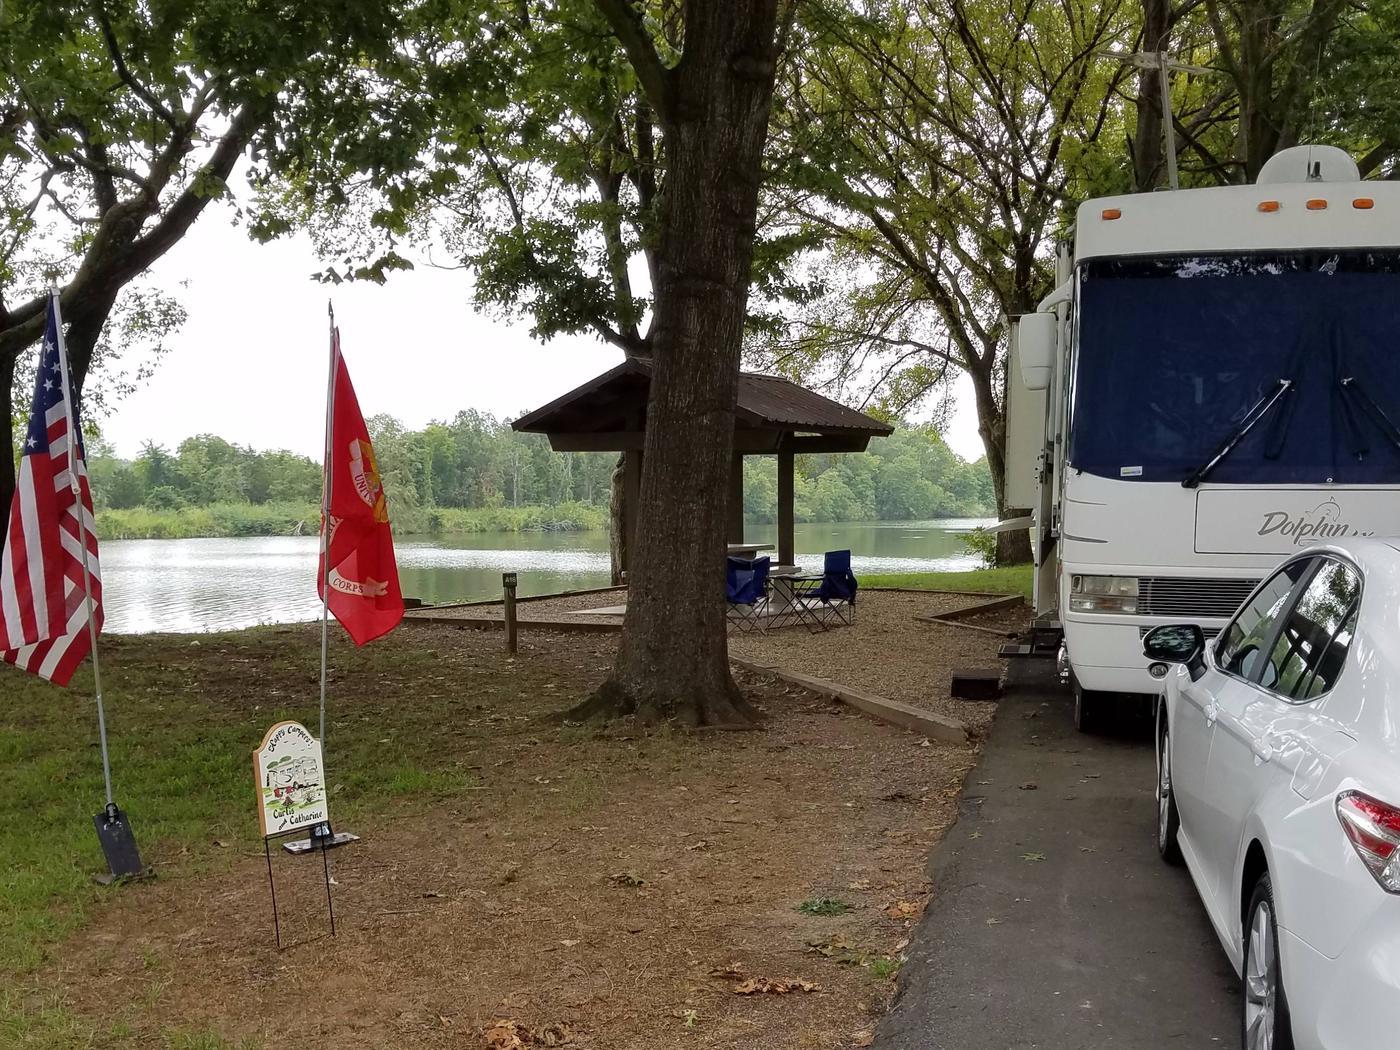 Campsite A18